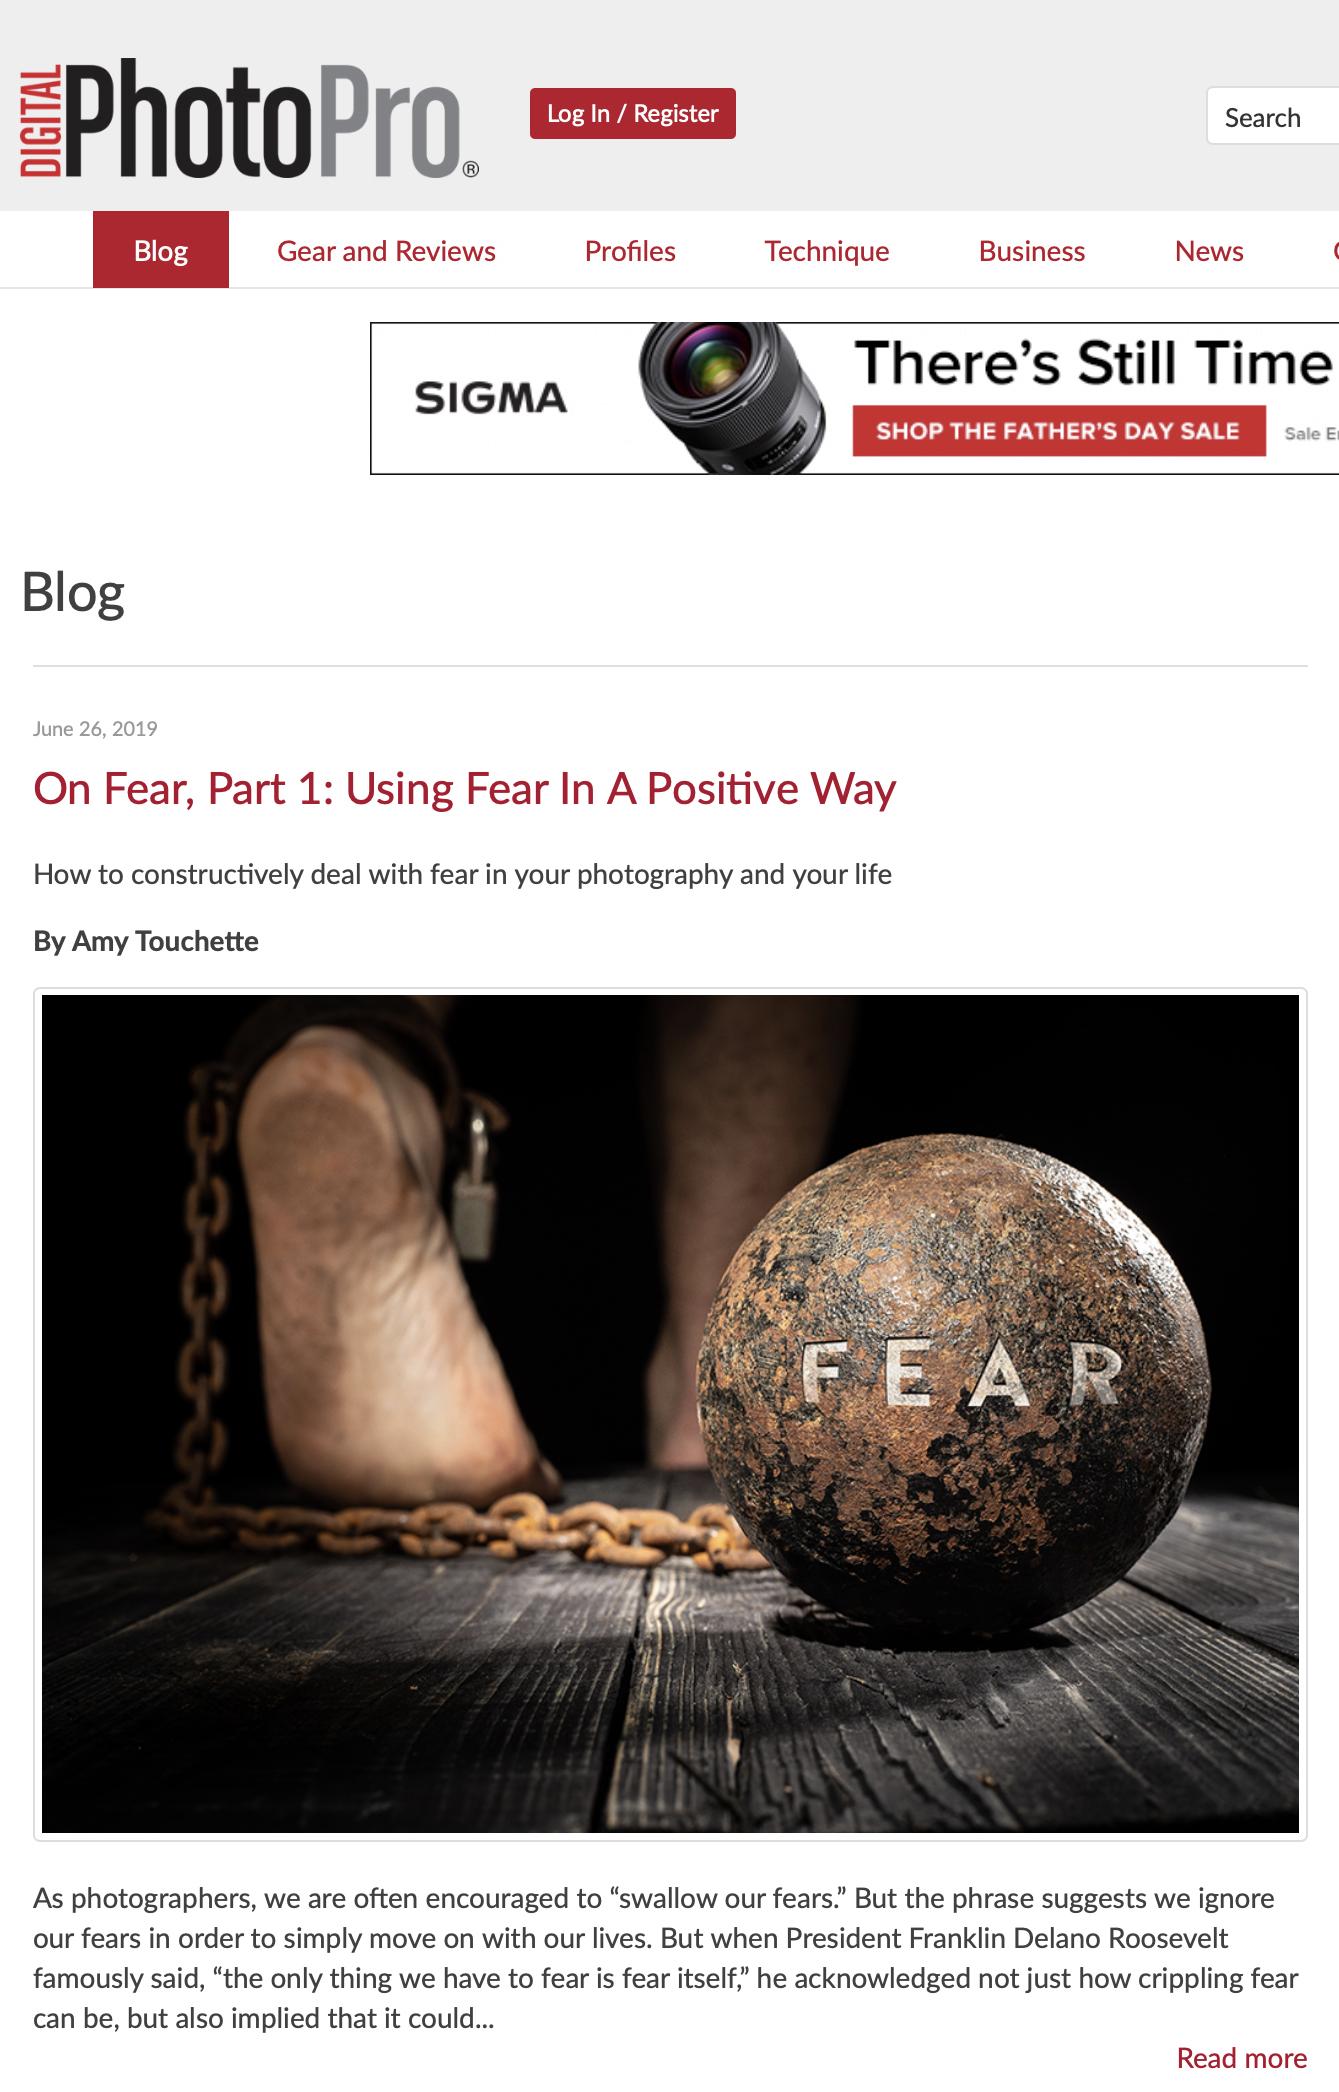 DPP Fear Pt 1_6.26.19.jpg